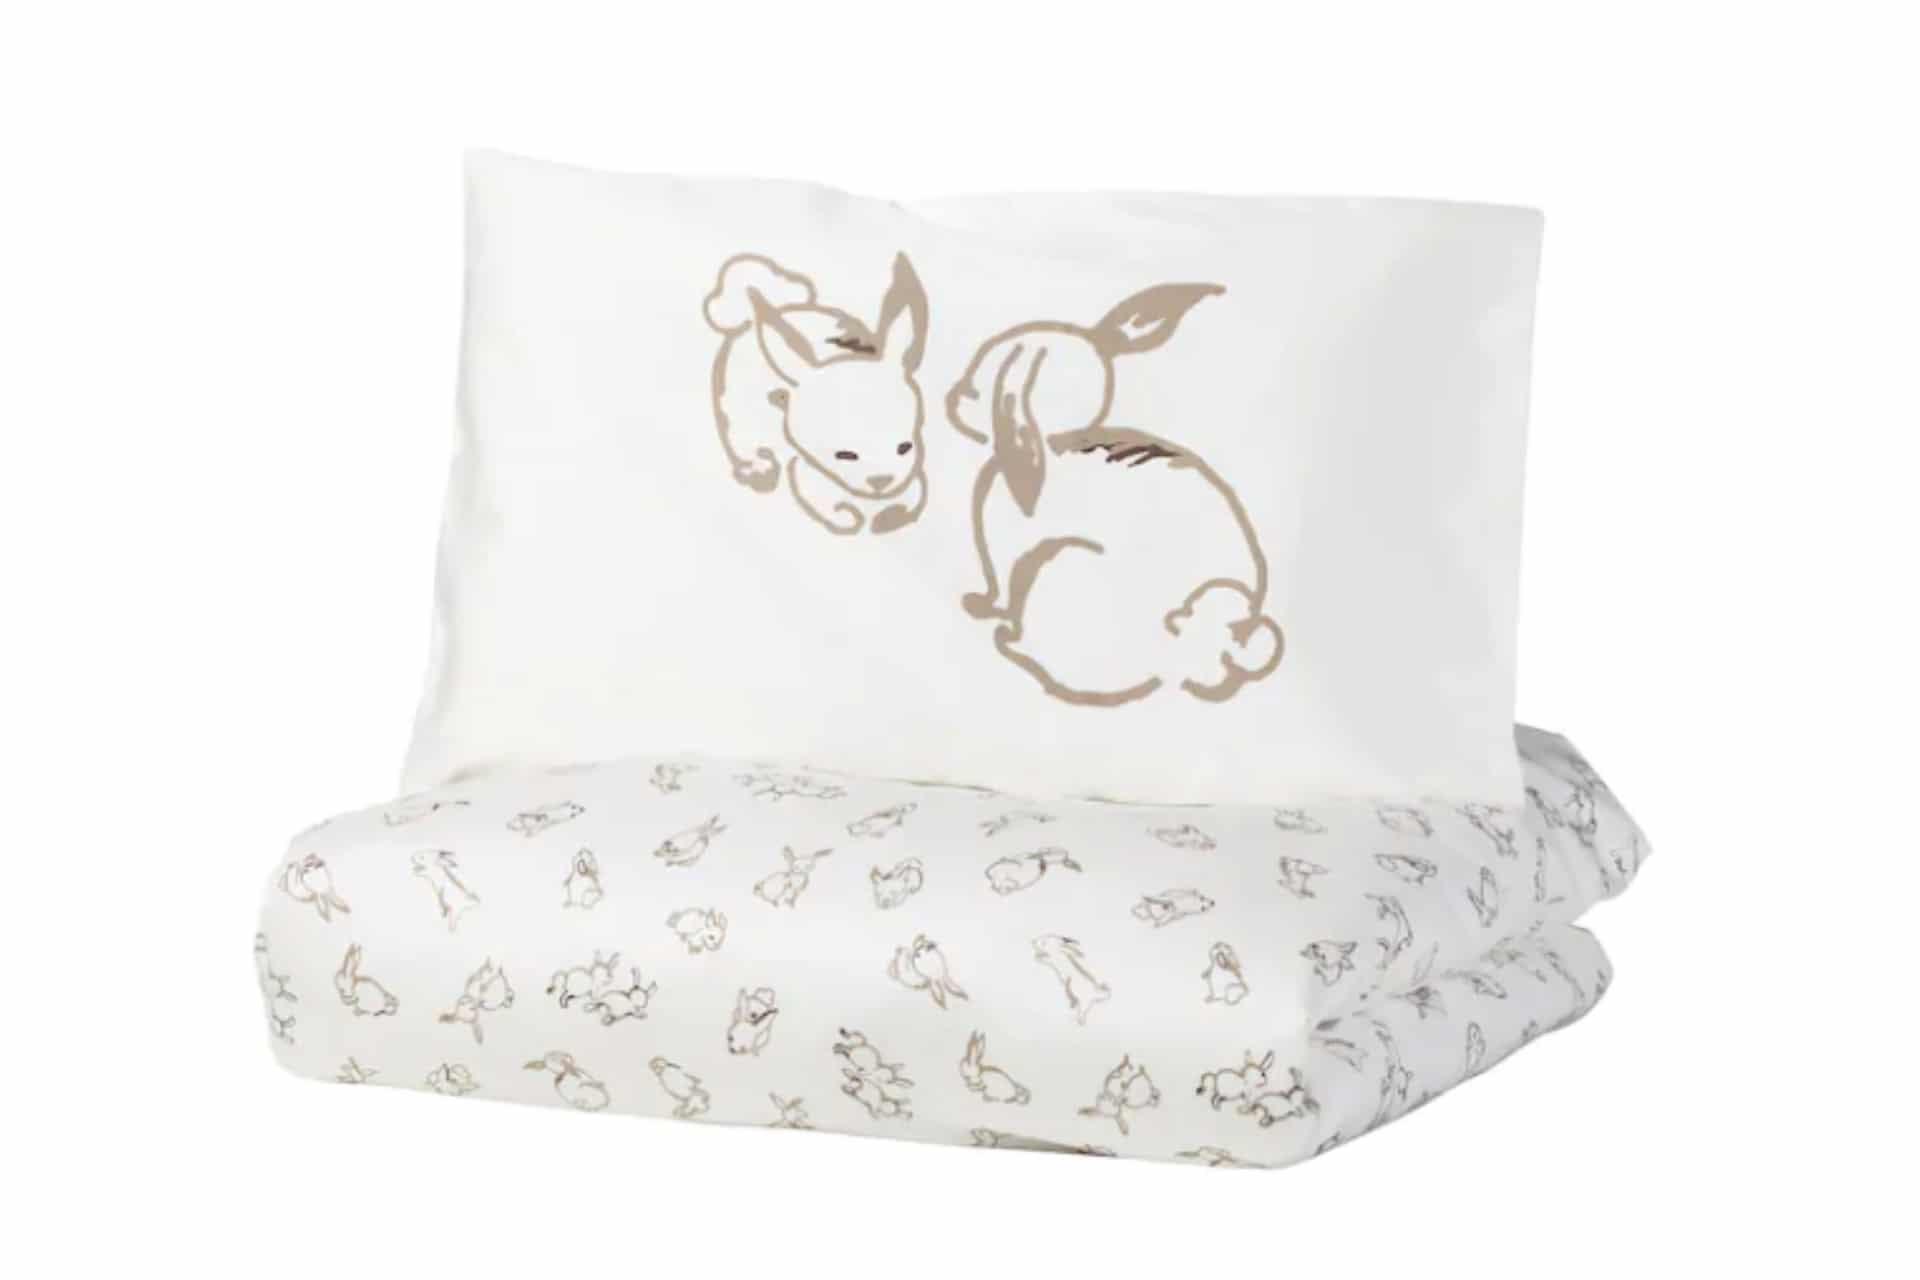 duvet set with rabbits